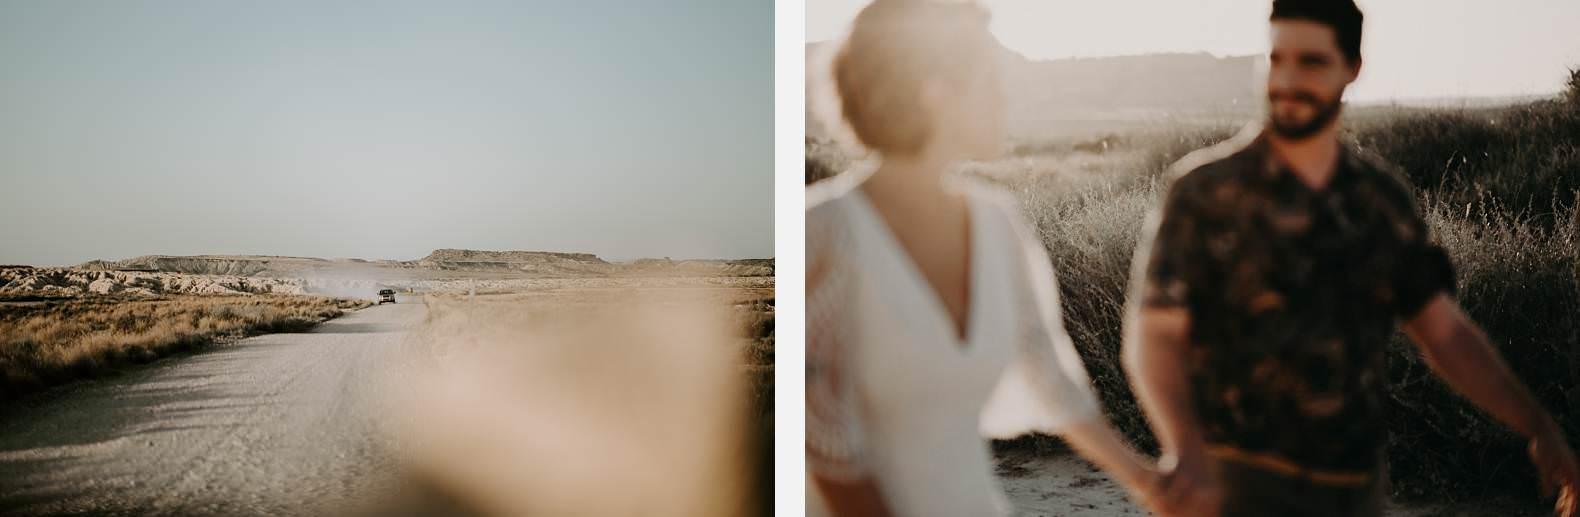 mariage espagne bardenas festival you and me elopement photographe bel esprit desert 0027